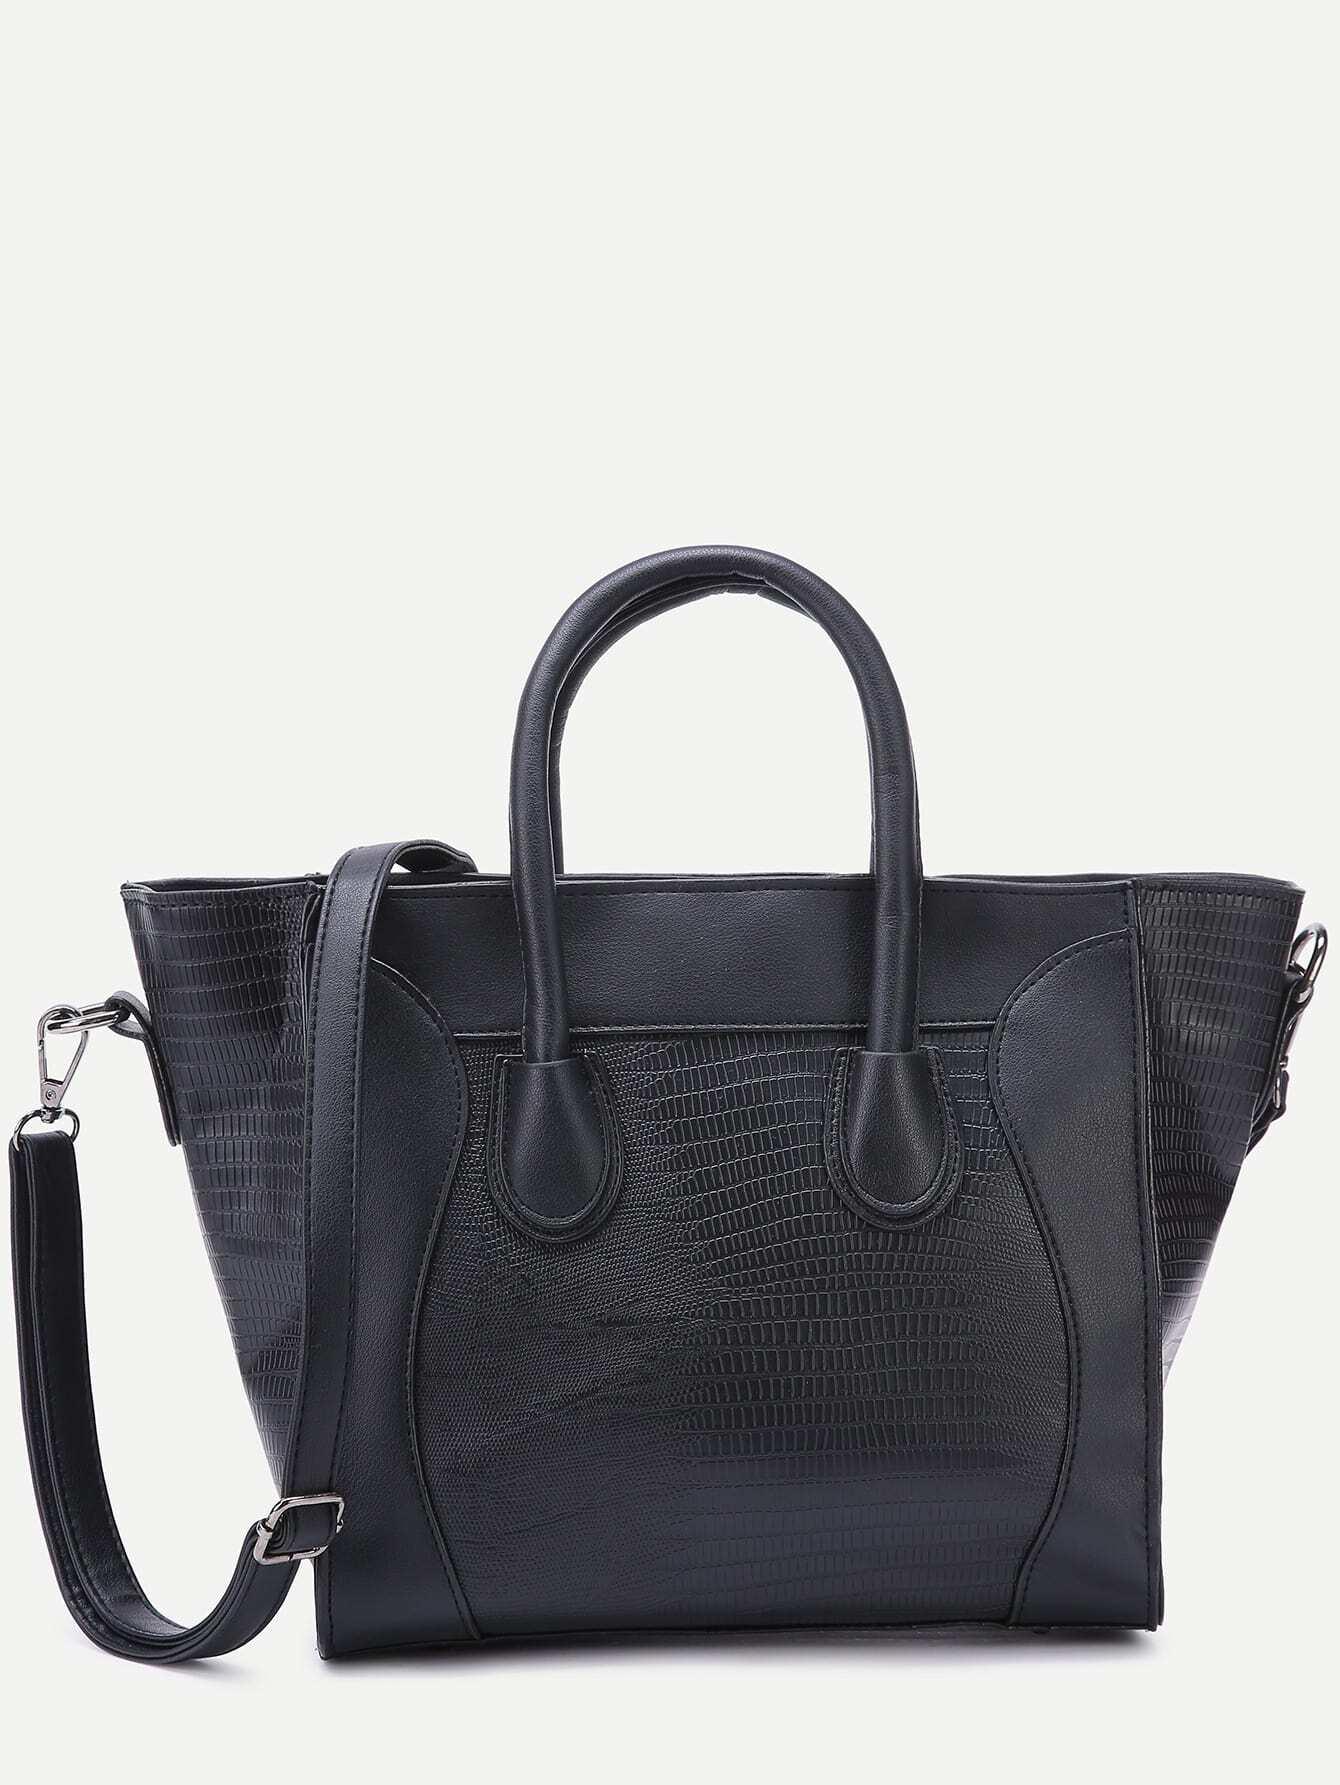 bag160907306_2